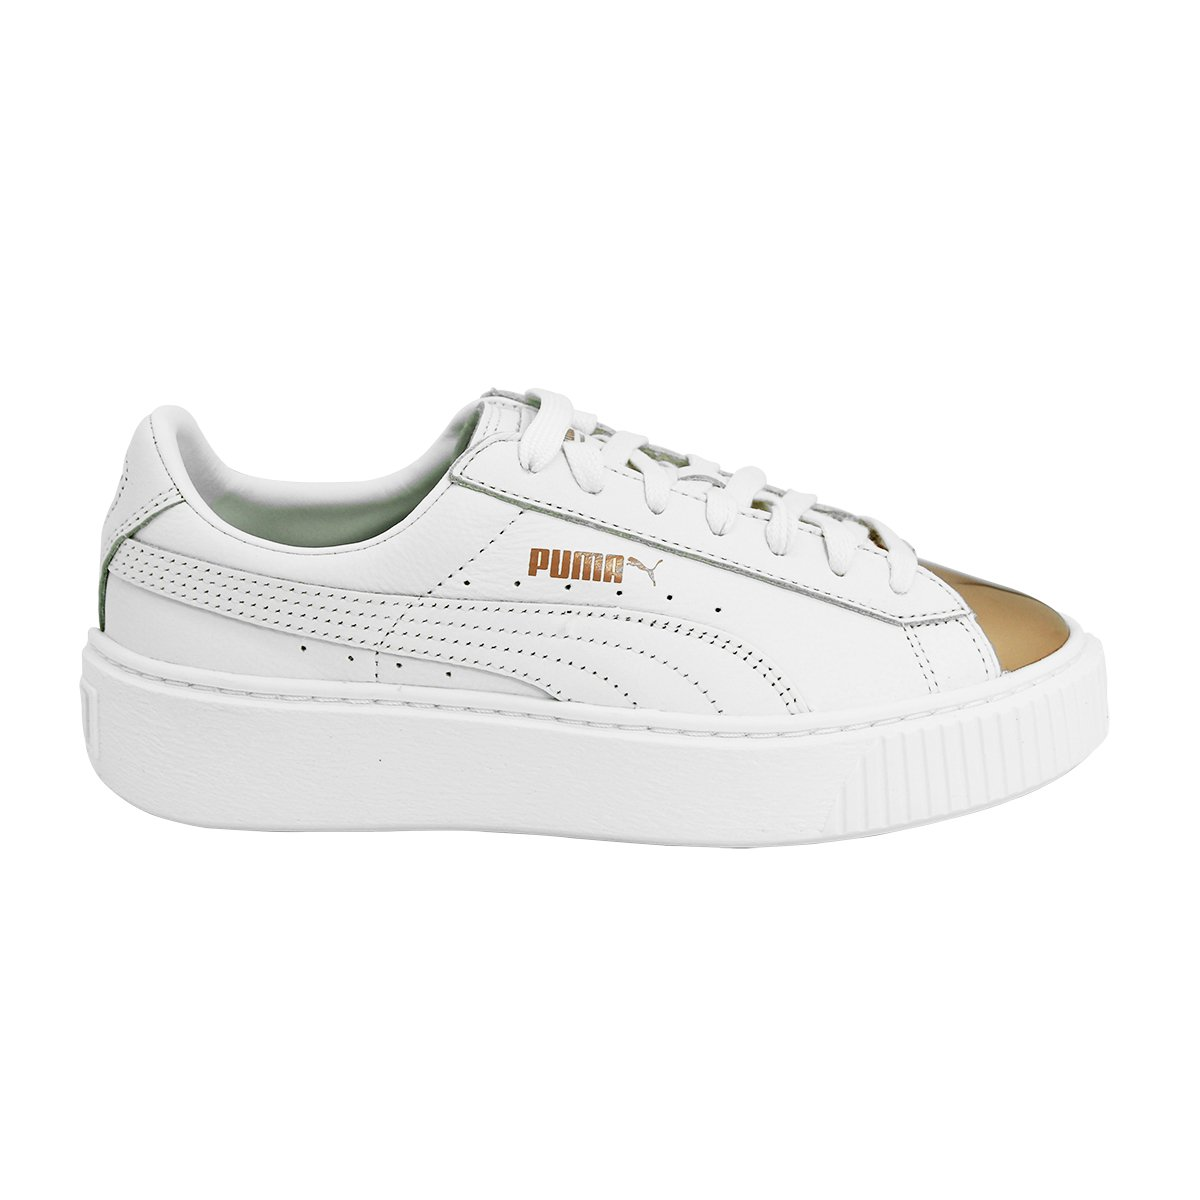 Puma Basket Platform Metallic, Sneakers Basses Femme 366169